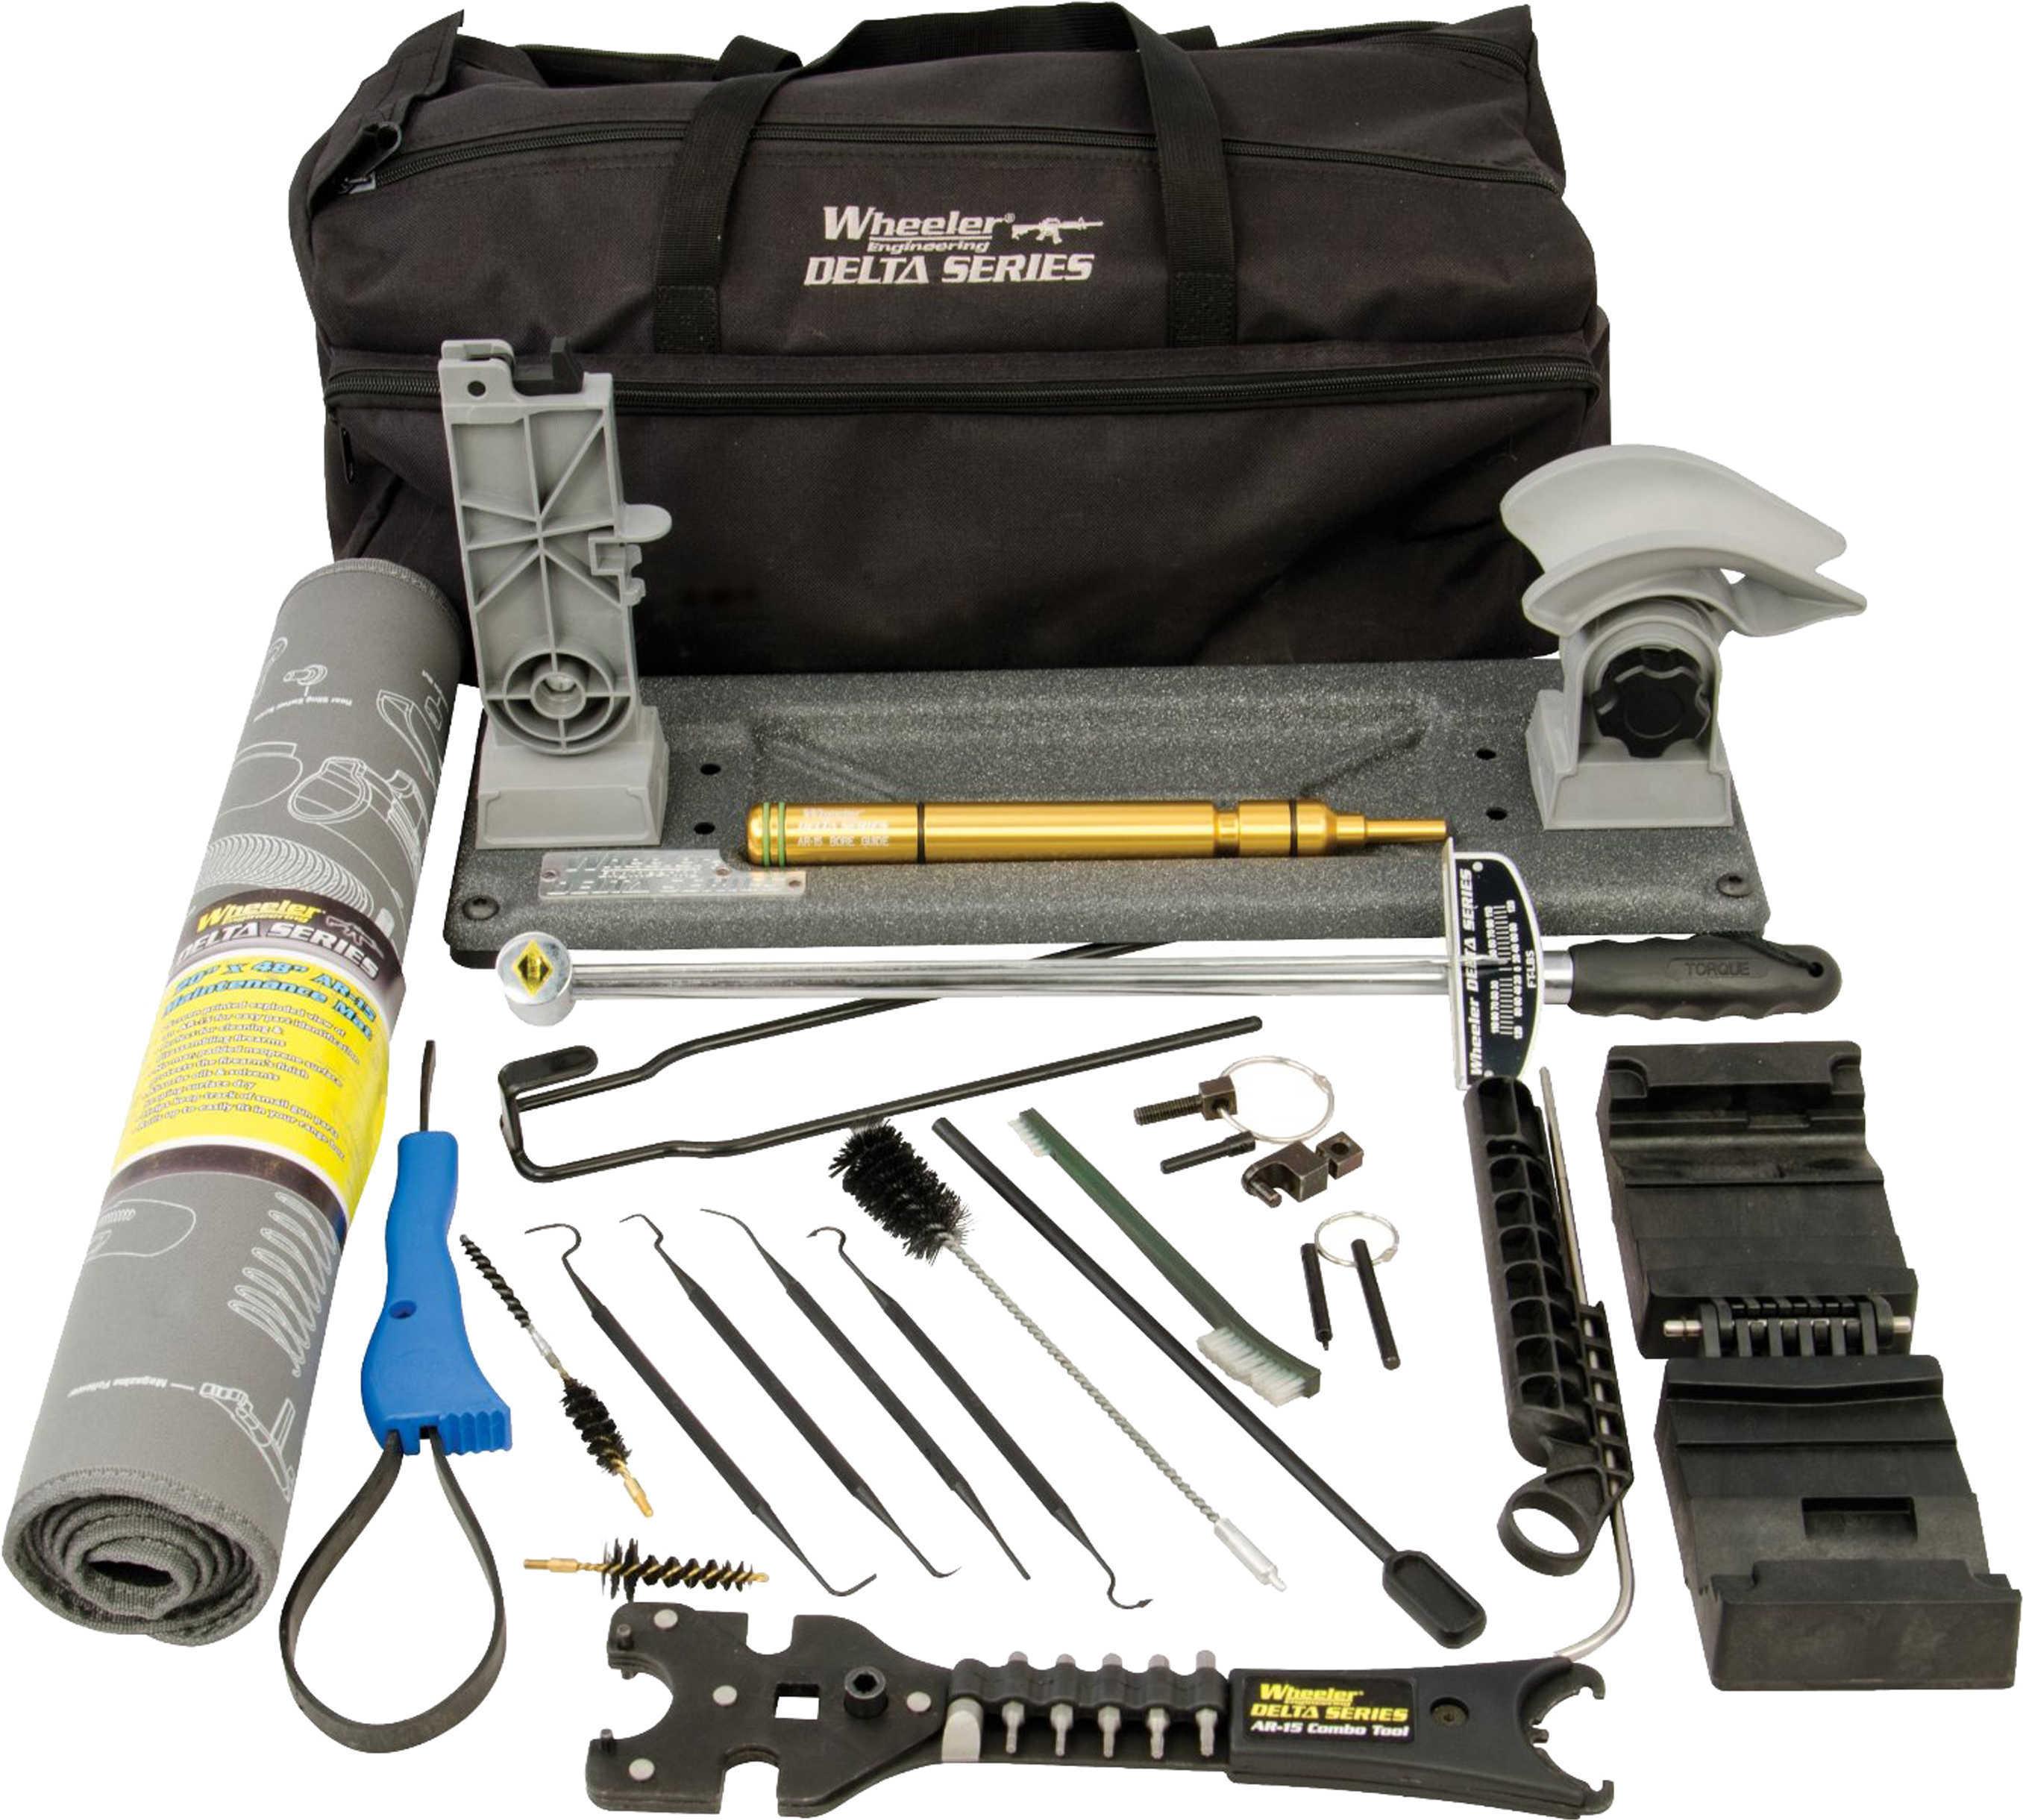 AR-15 Wheeler AR Armorers Professional Kit